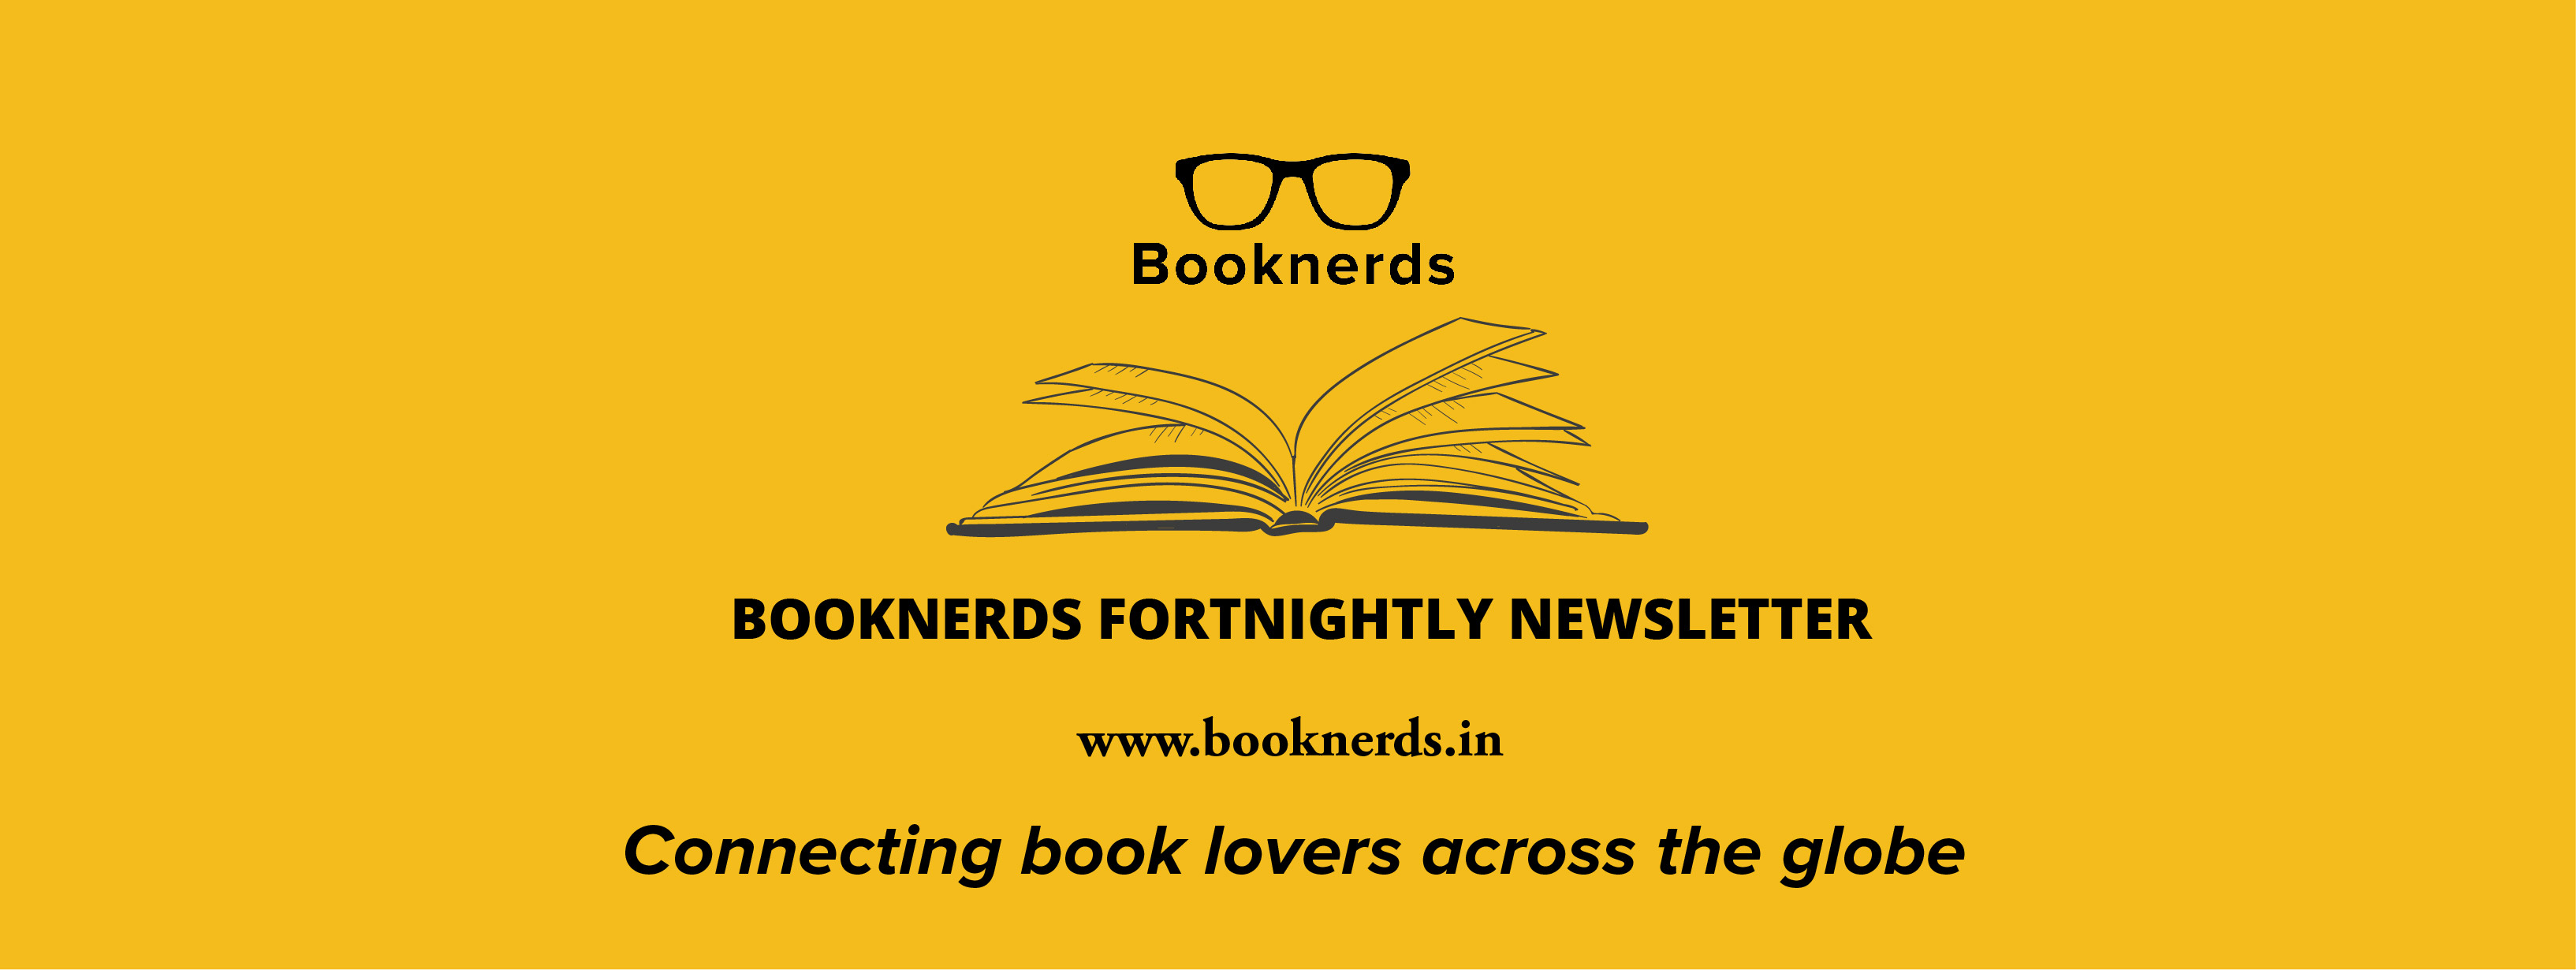 Booknerds Fortnightly Newsletter |October 1|2020